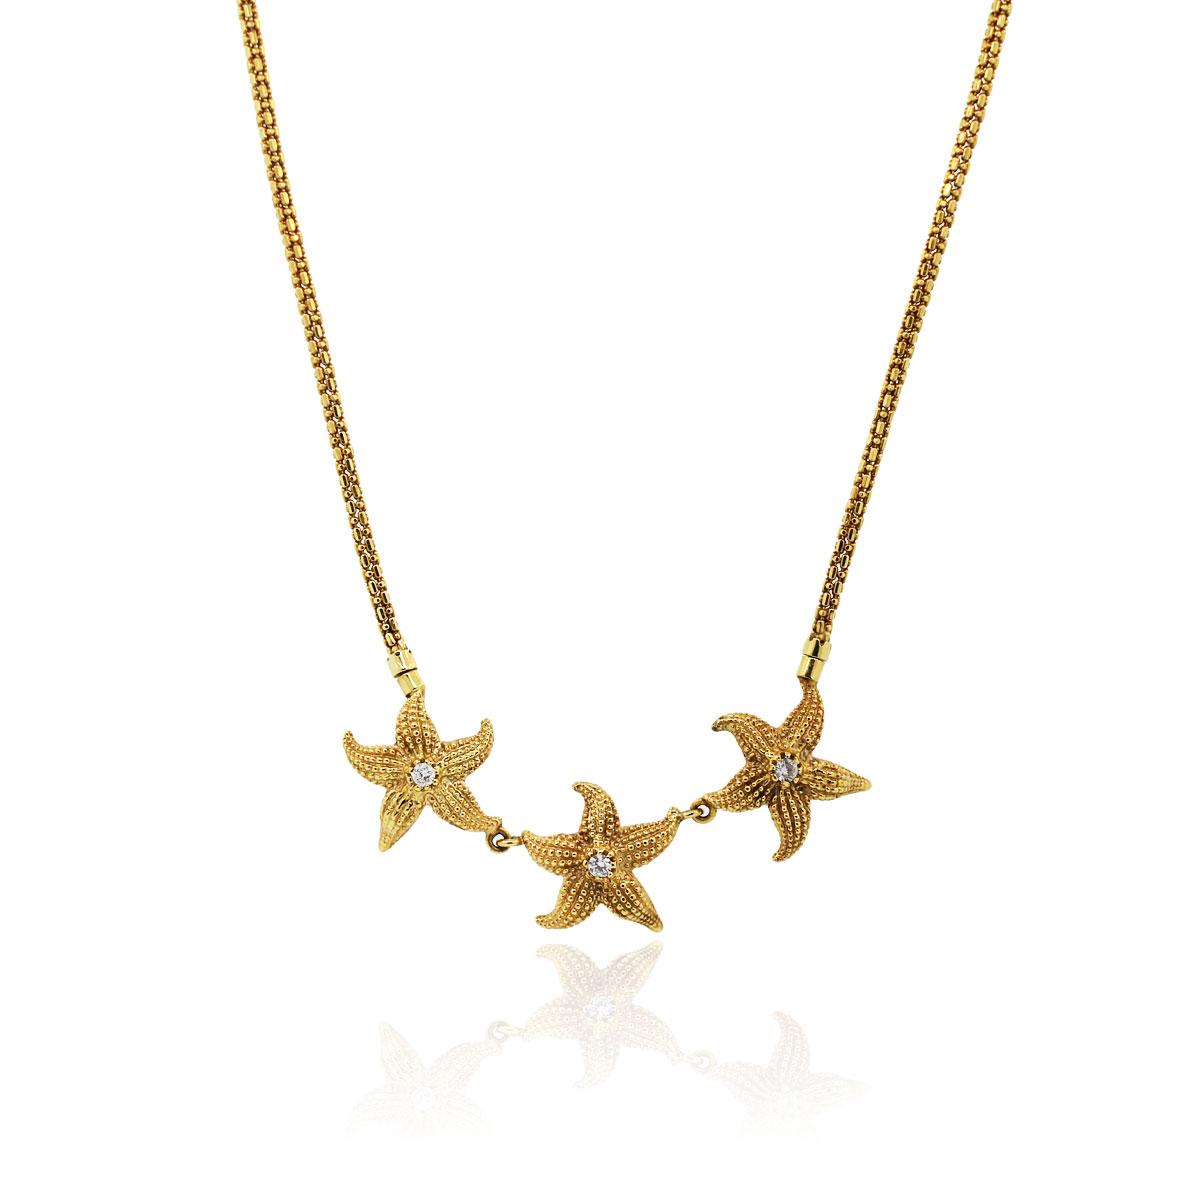 14k Yellow Gold 30ctw Diamond Starfish Necklace